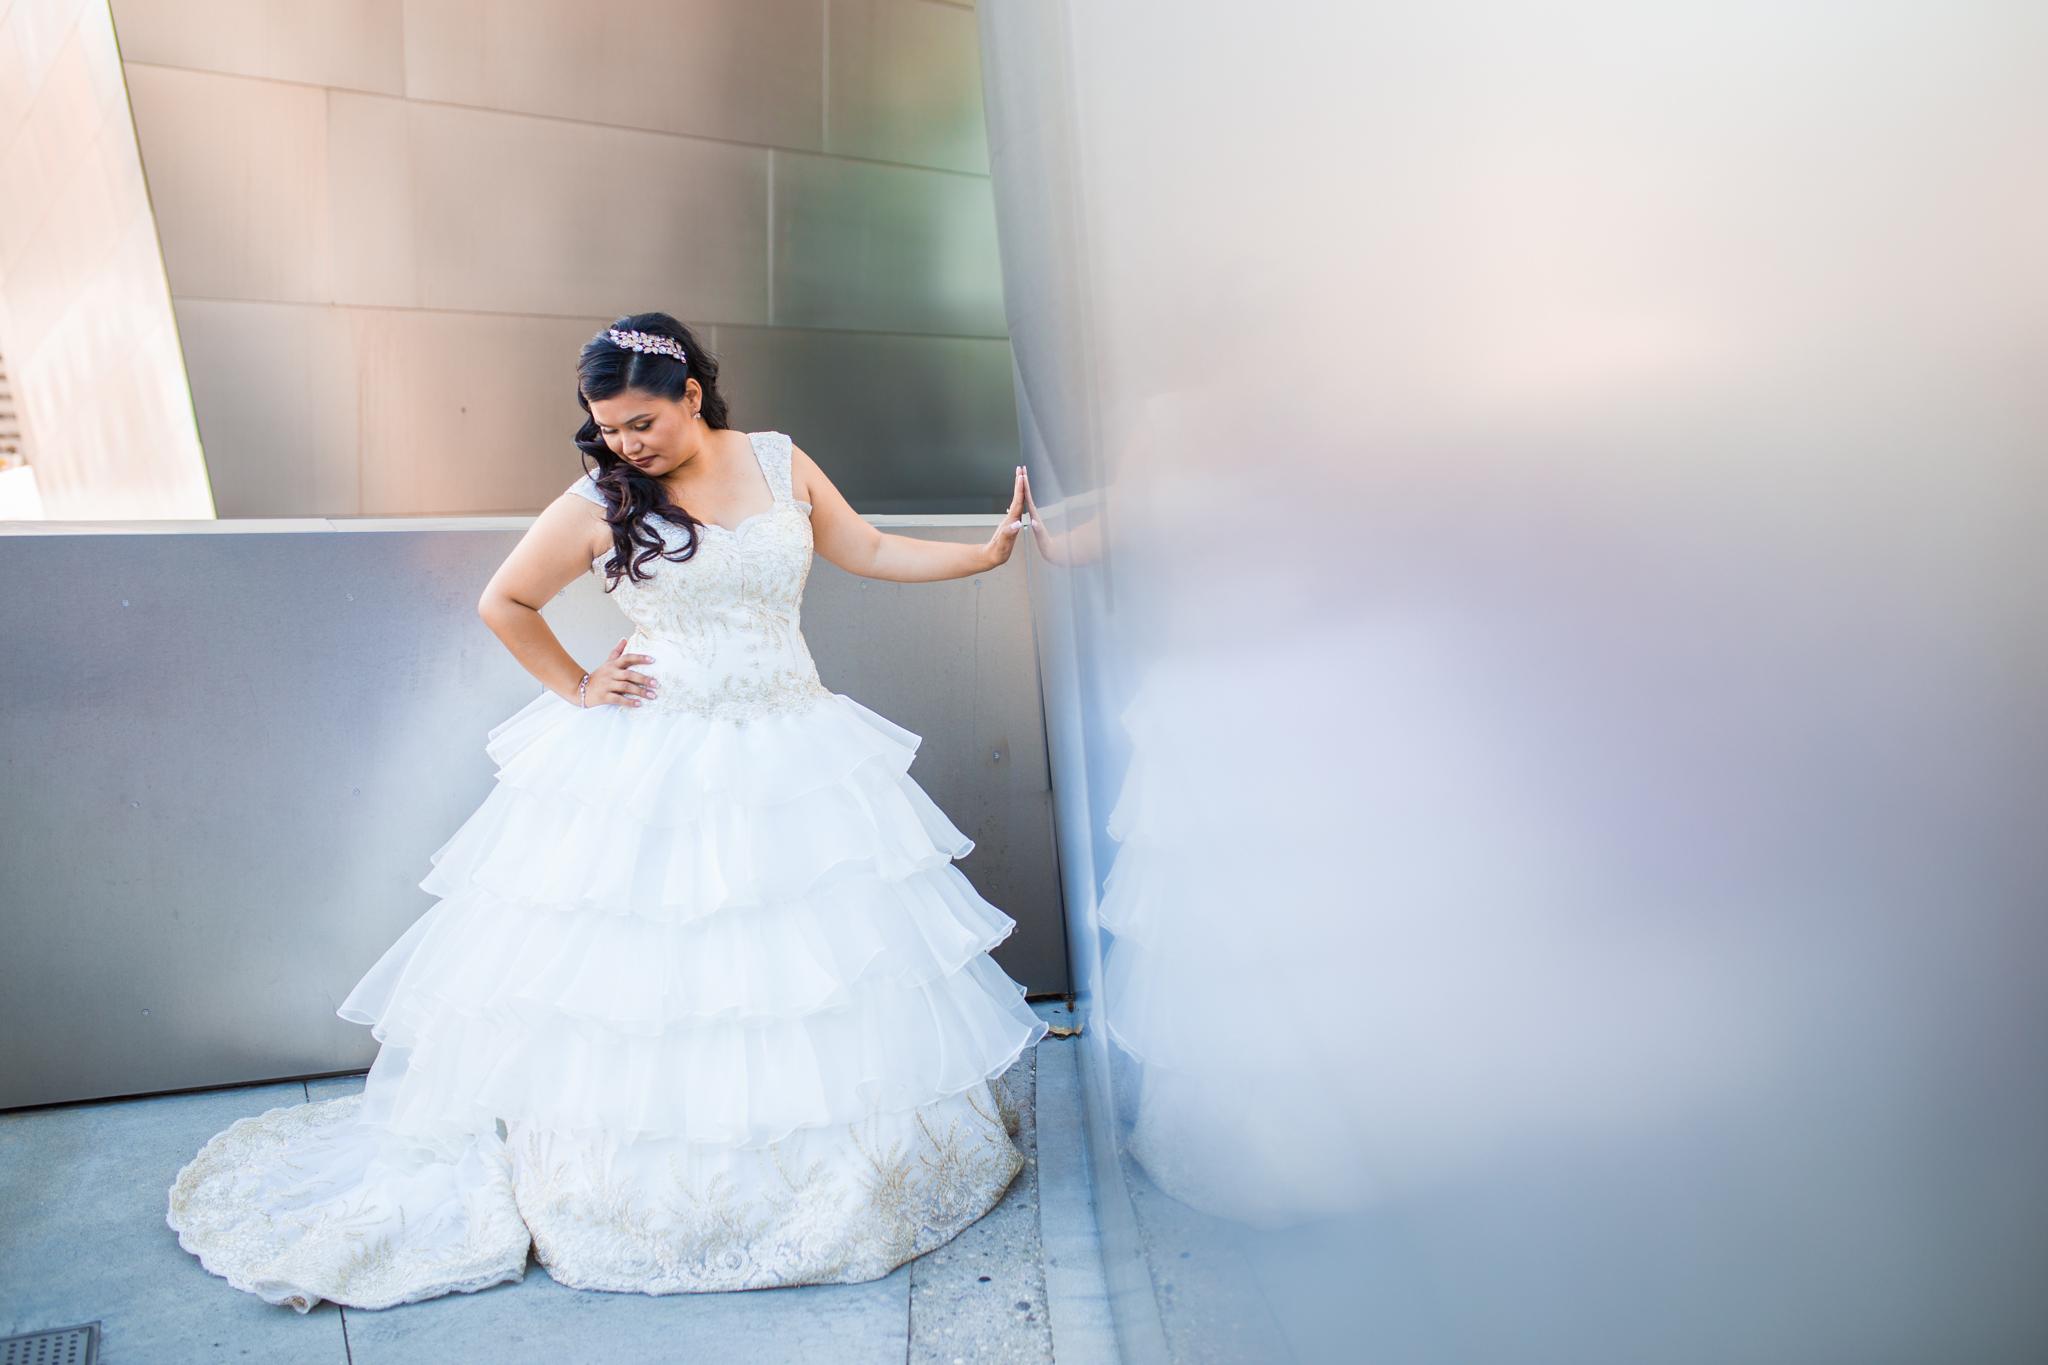 18_07JUL 21 Griselda's Wedding-0829.jpg